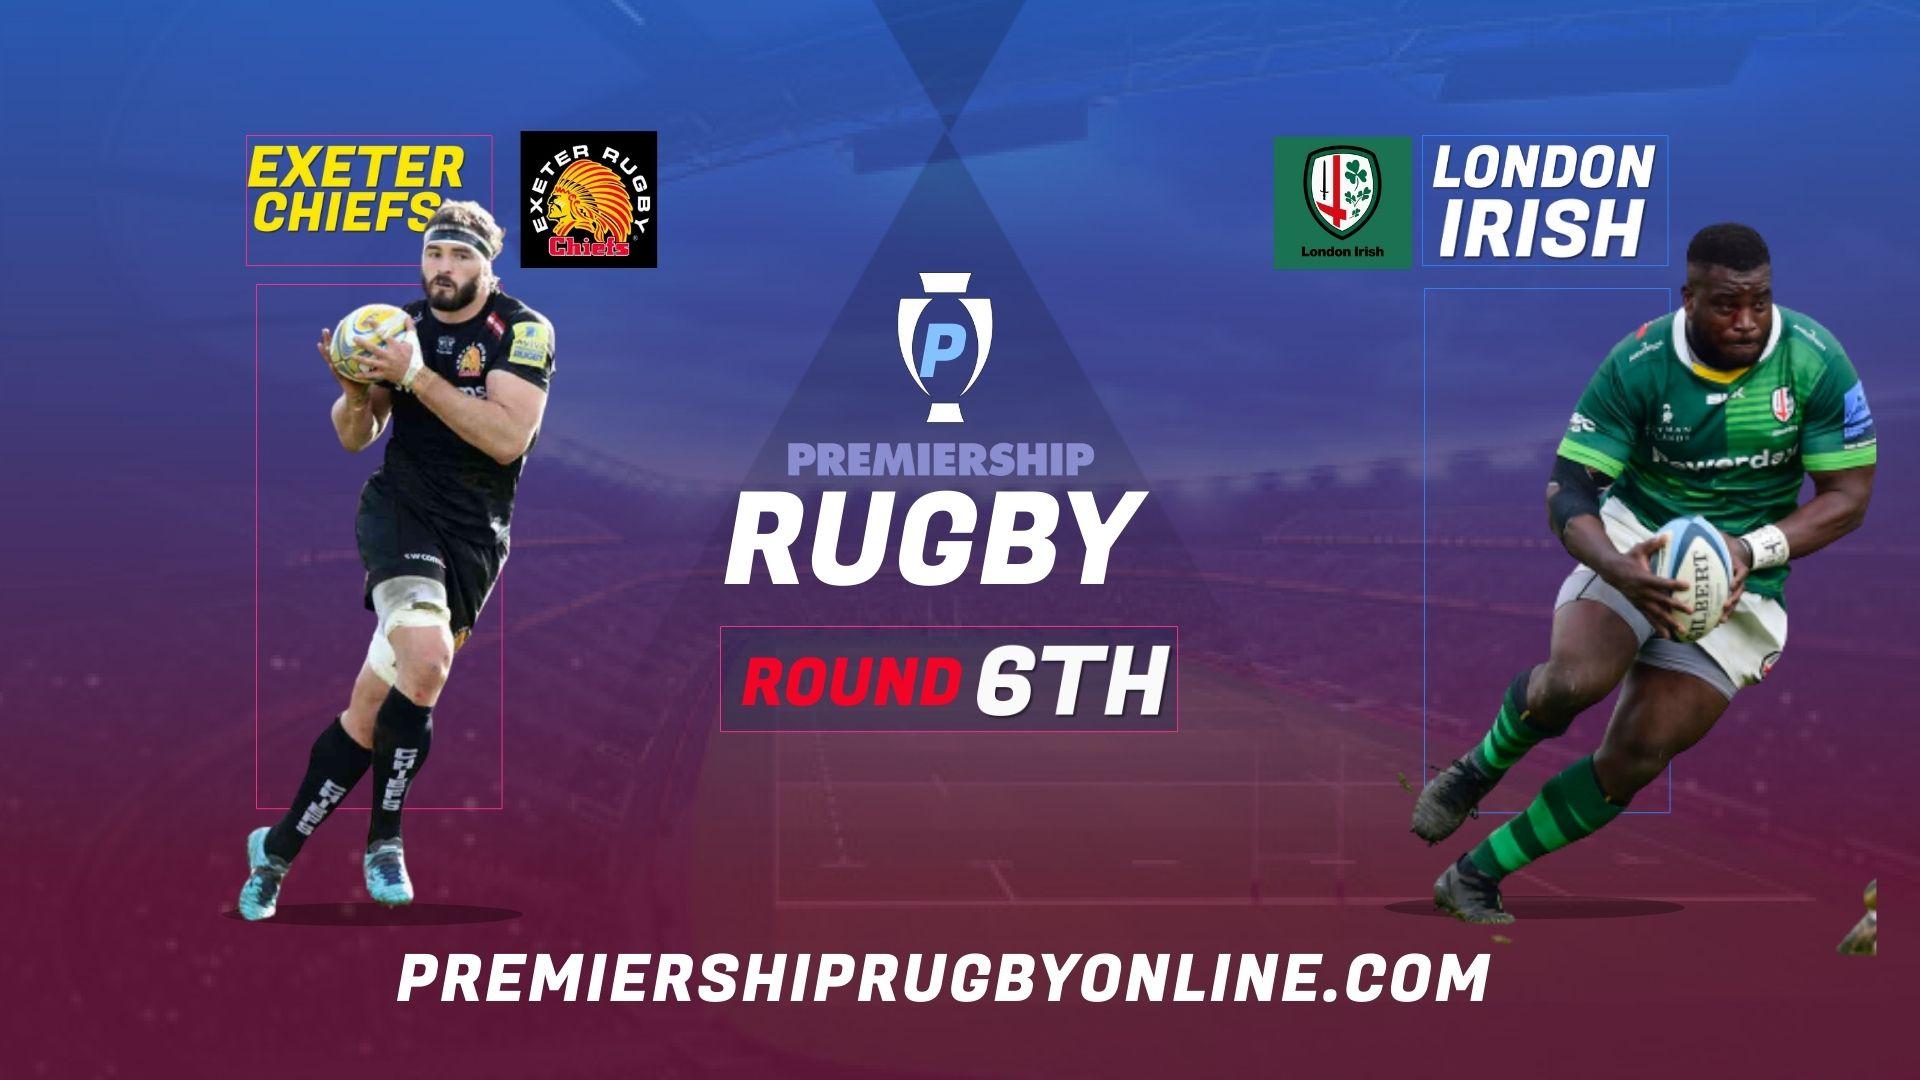 Exeter Chiefs Vs London Irish Live Stream 2021-22 | Premiership Rugby Round 6